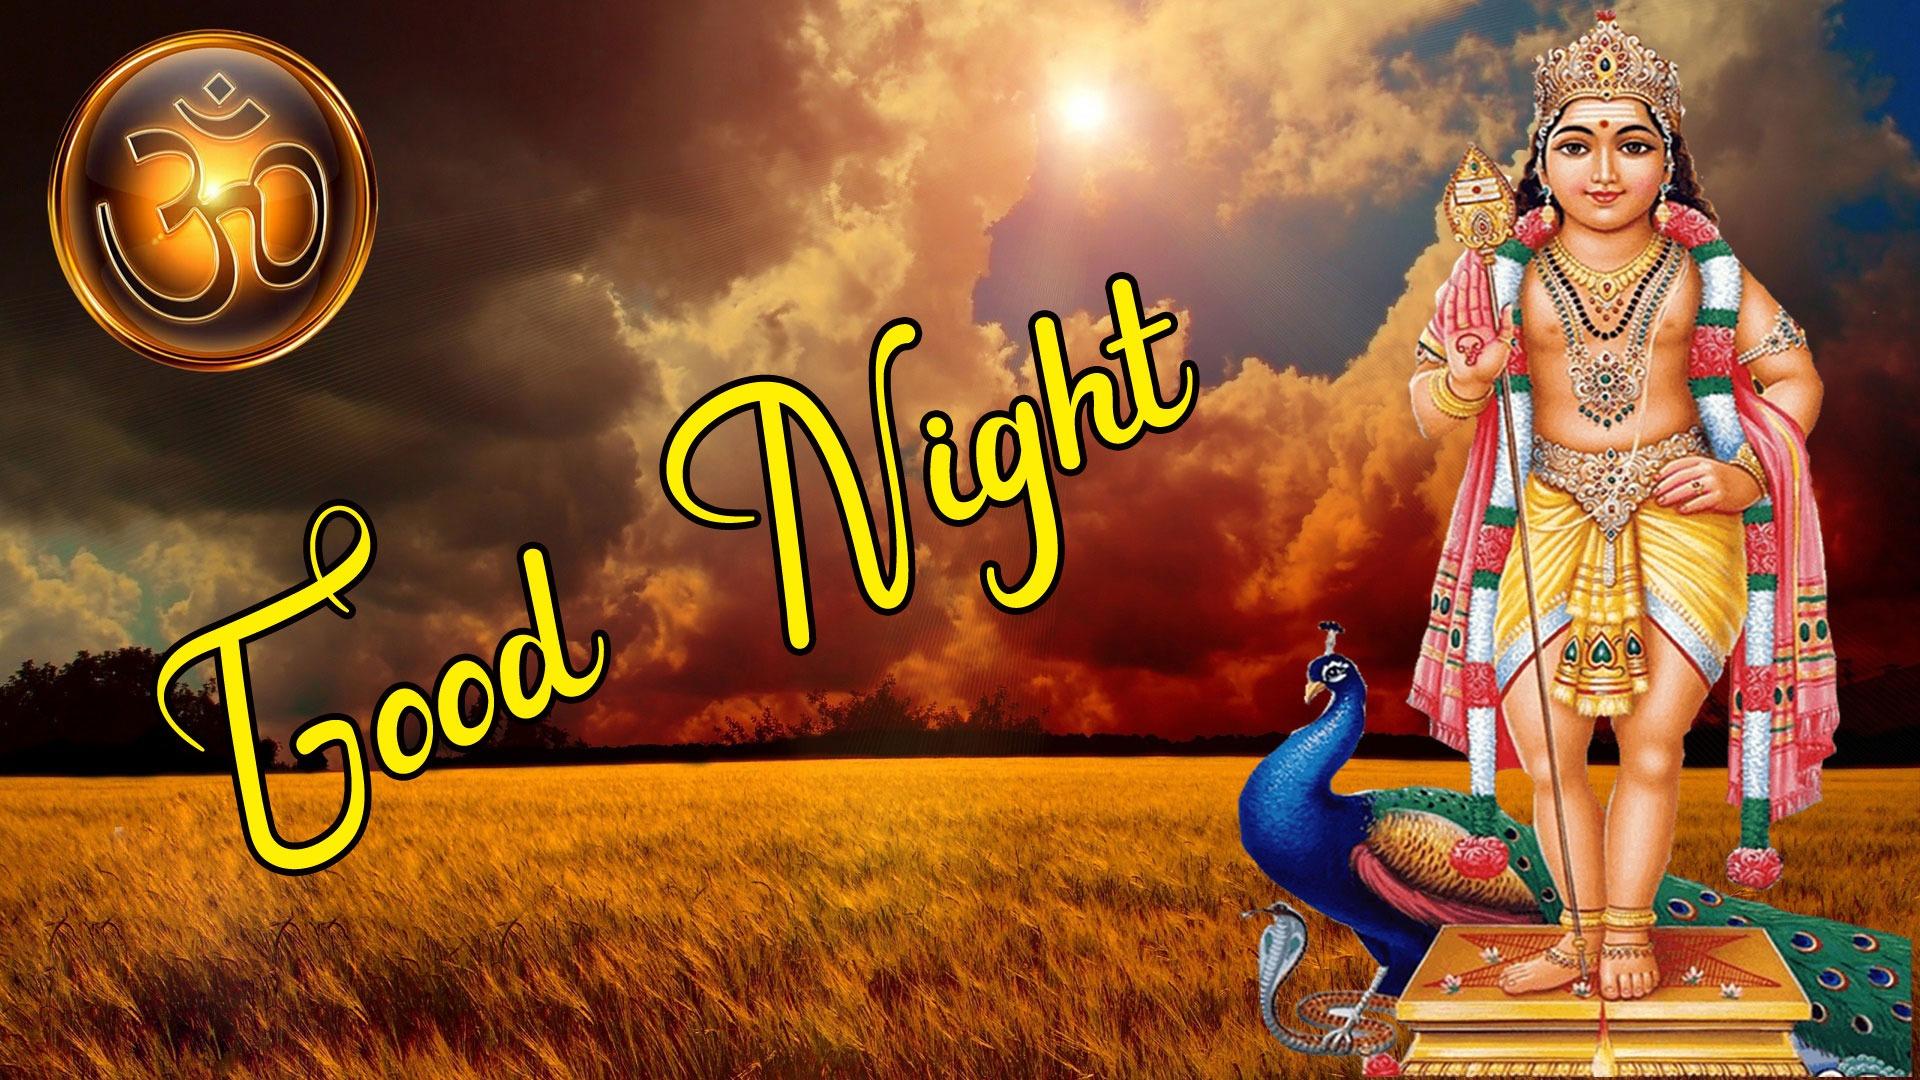 Beautiful New Good Night Images wallpaper photo hd